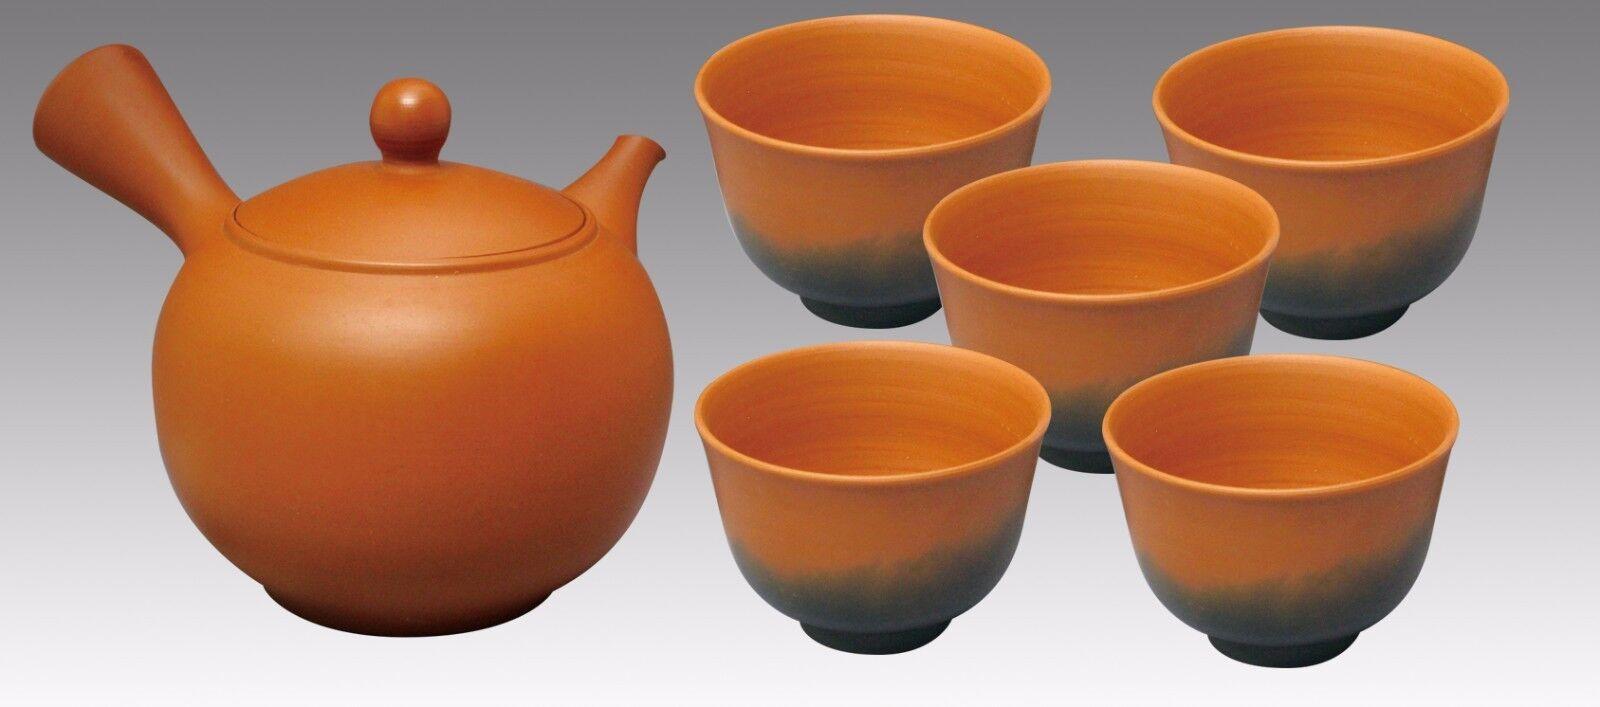 Tokoname Kyusu Teaset 3 - KOJI - Vermilion 1pot & 5chawan cups